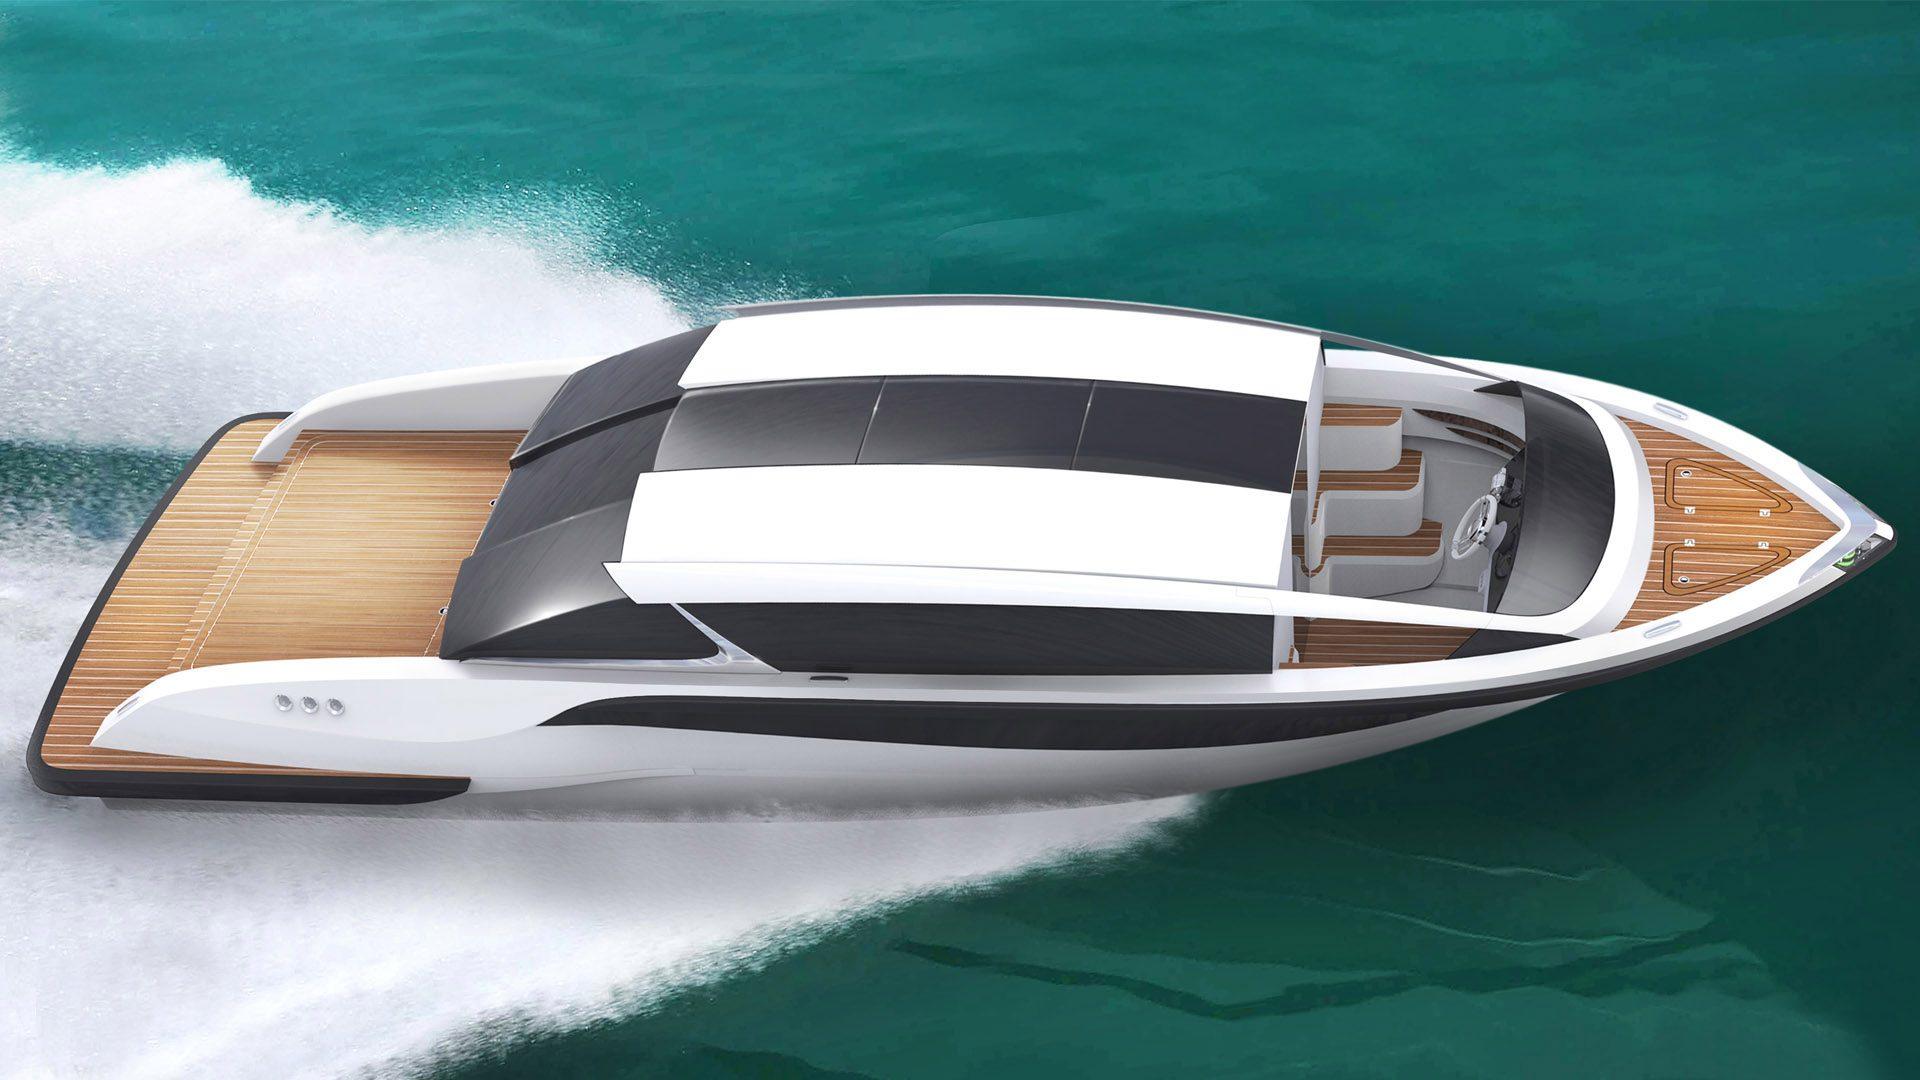 Superyacht tenders, limousine luxury tender boat, Silverline design by Hamid Bekradi fromHBD Studios